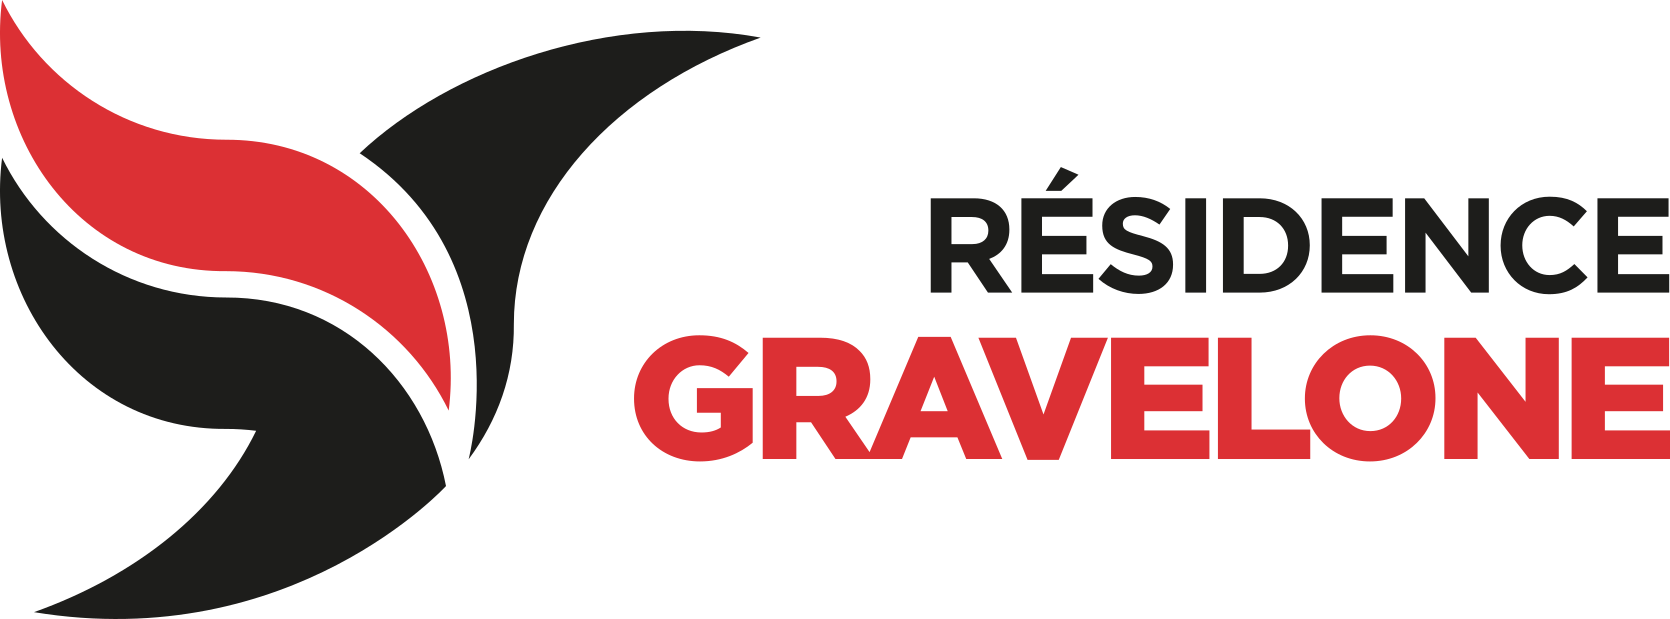 Résidence Gravelone